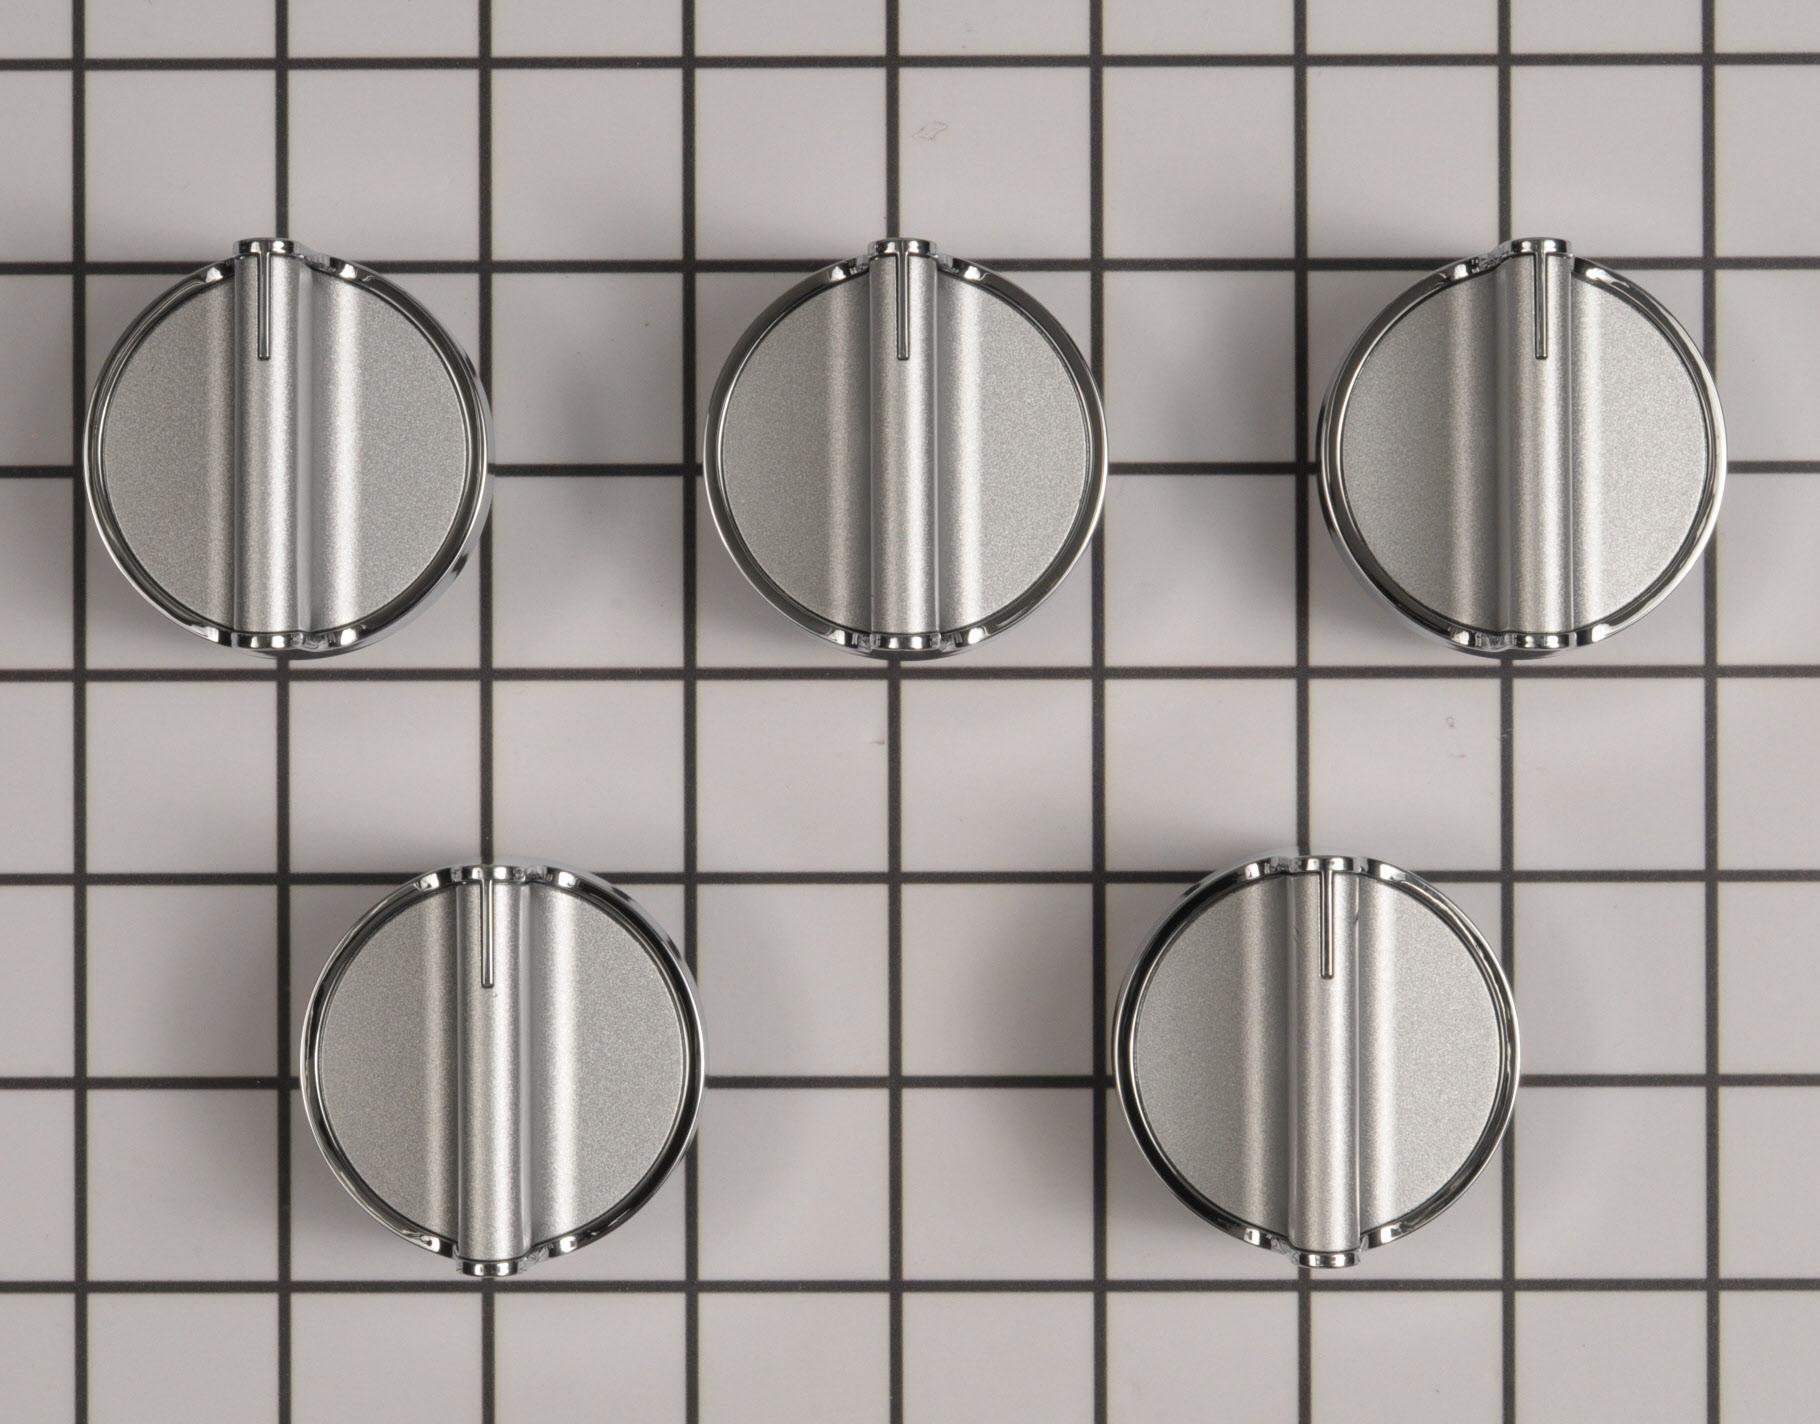 Whirlpool Range/Stove/Oven Part # W10698166 - Control Knob